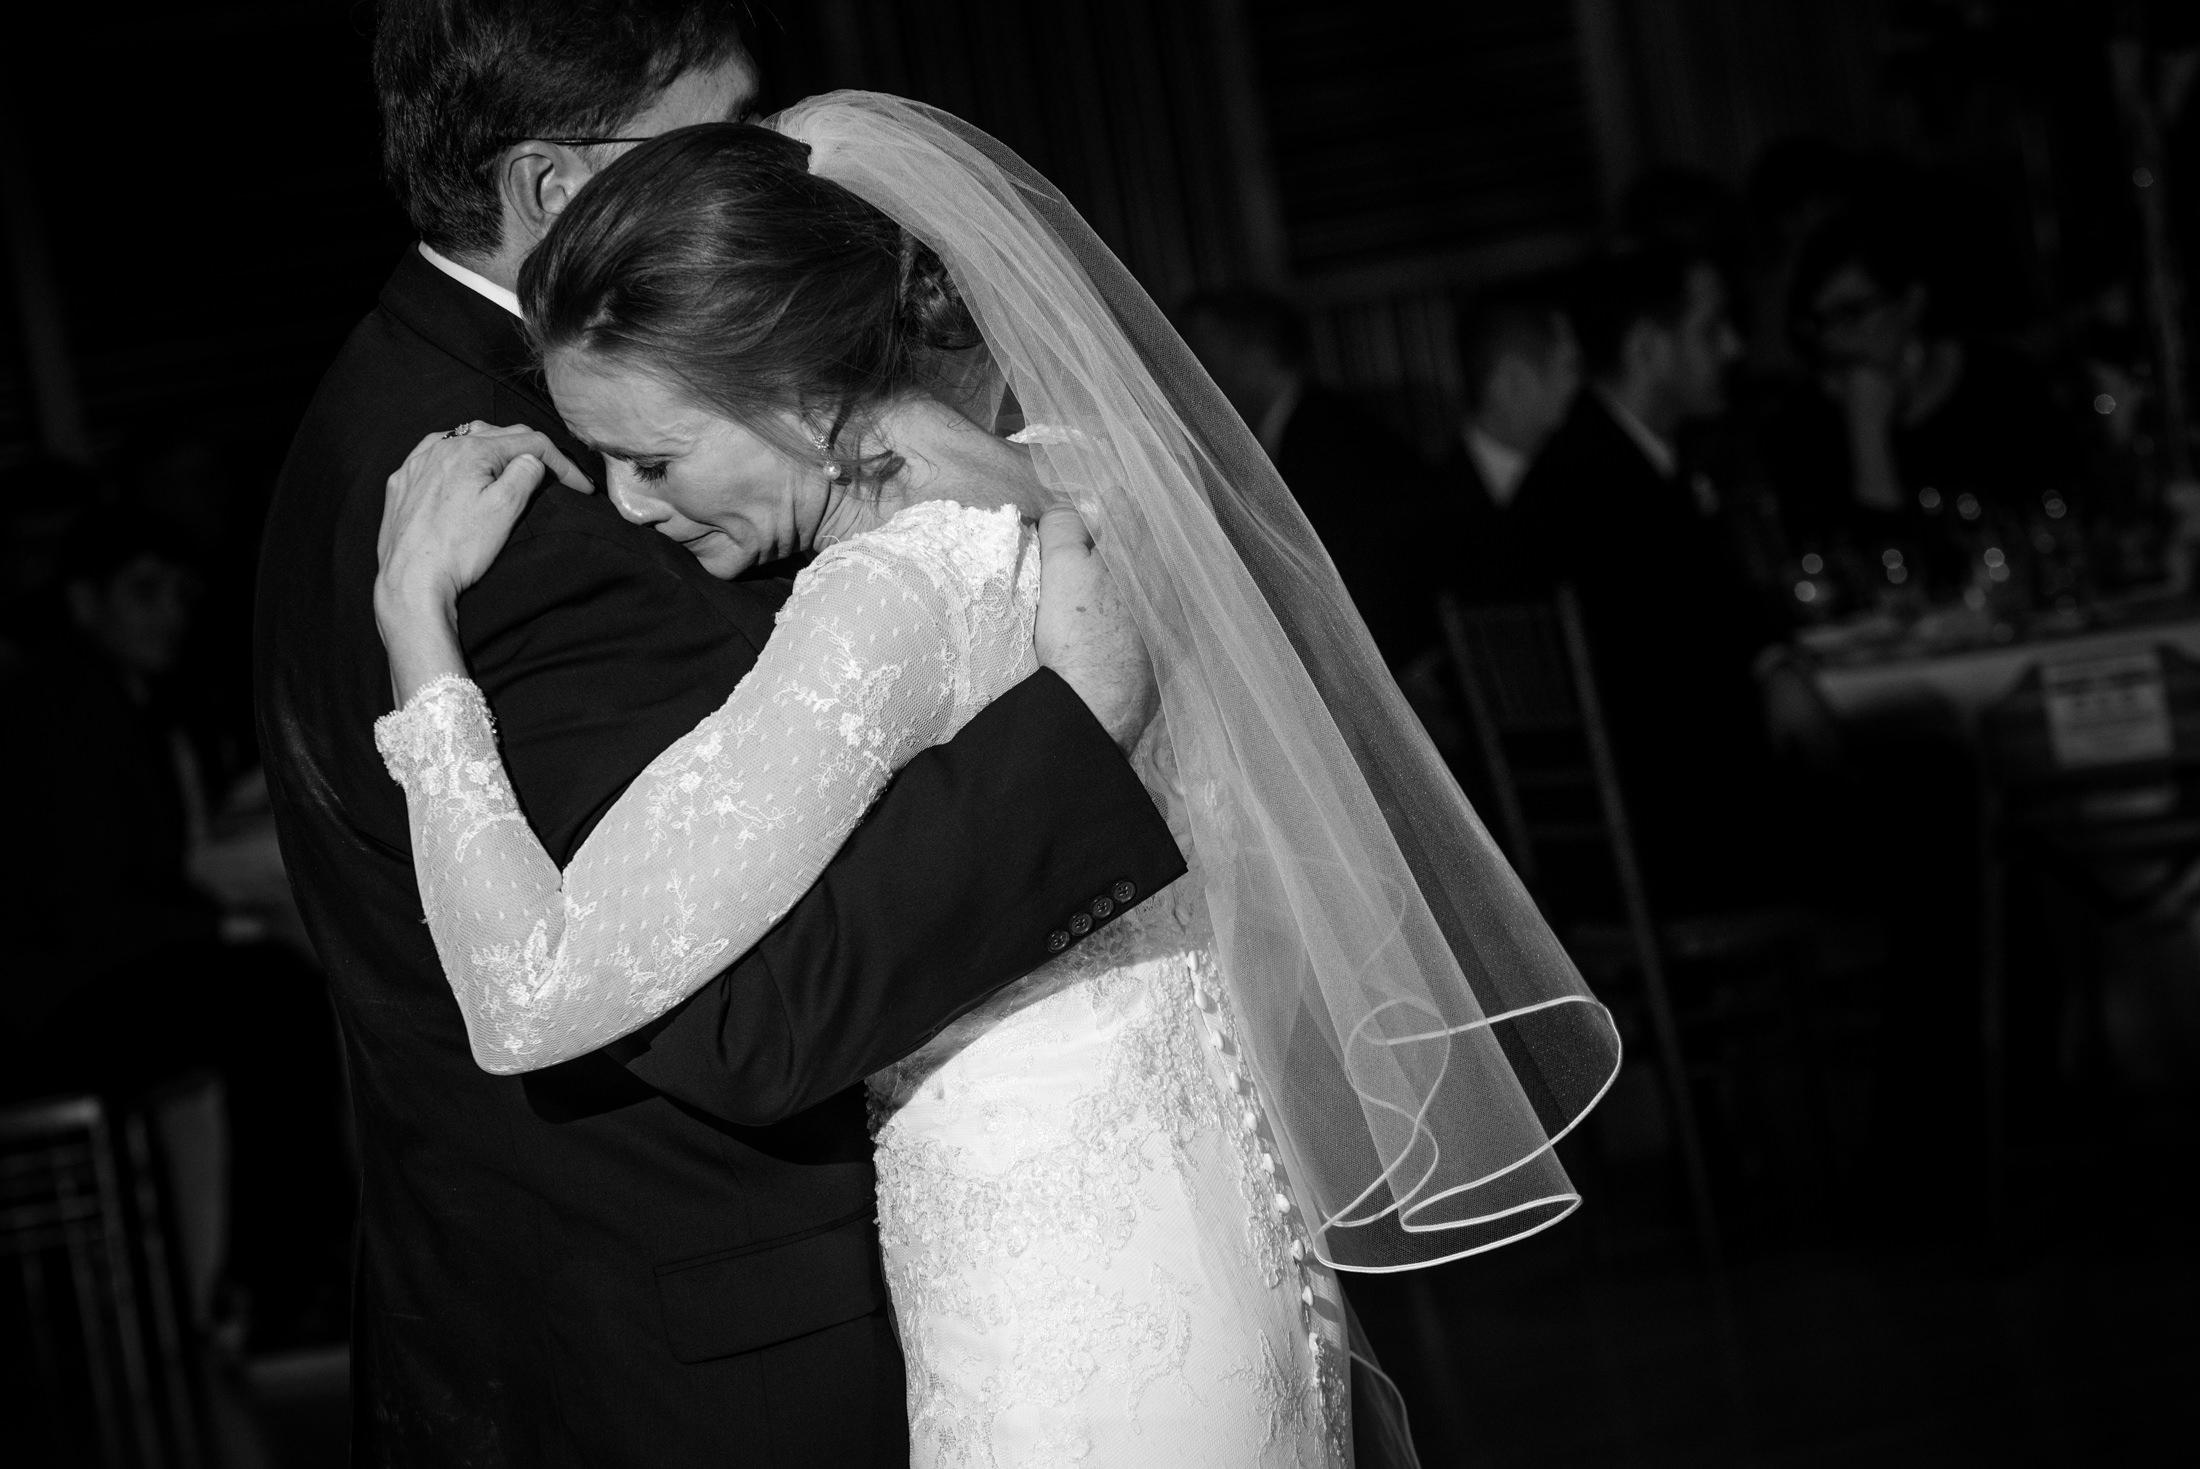 holland-center-reception-omaha-wedding-photographer-0008.JPG